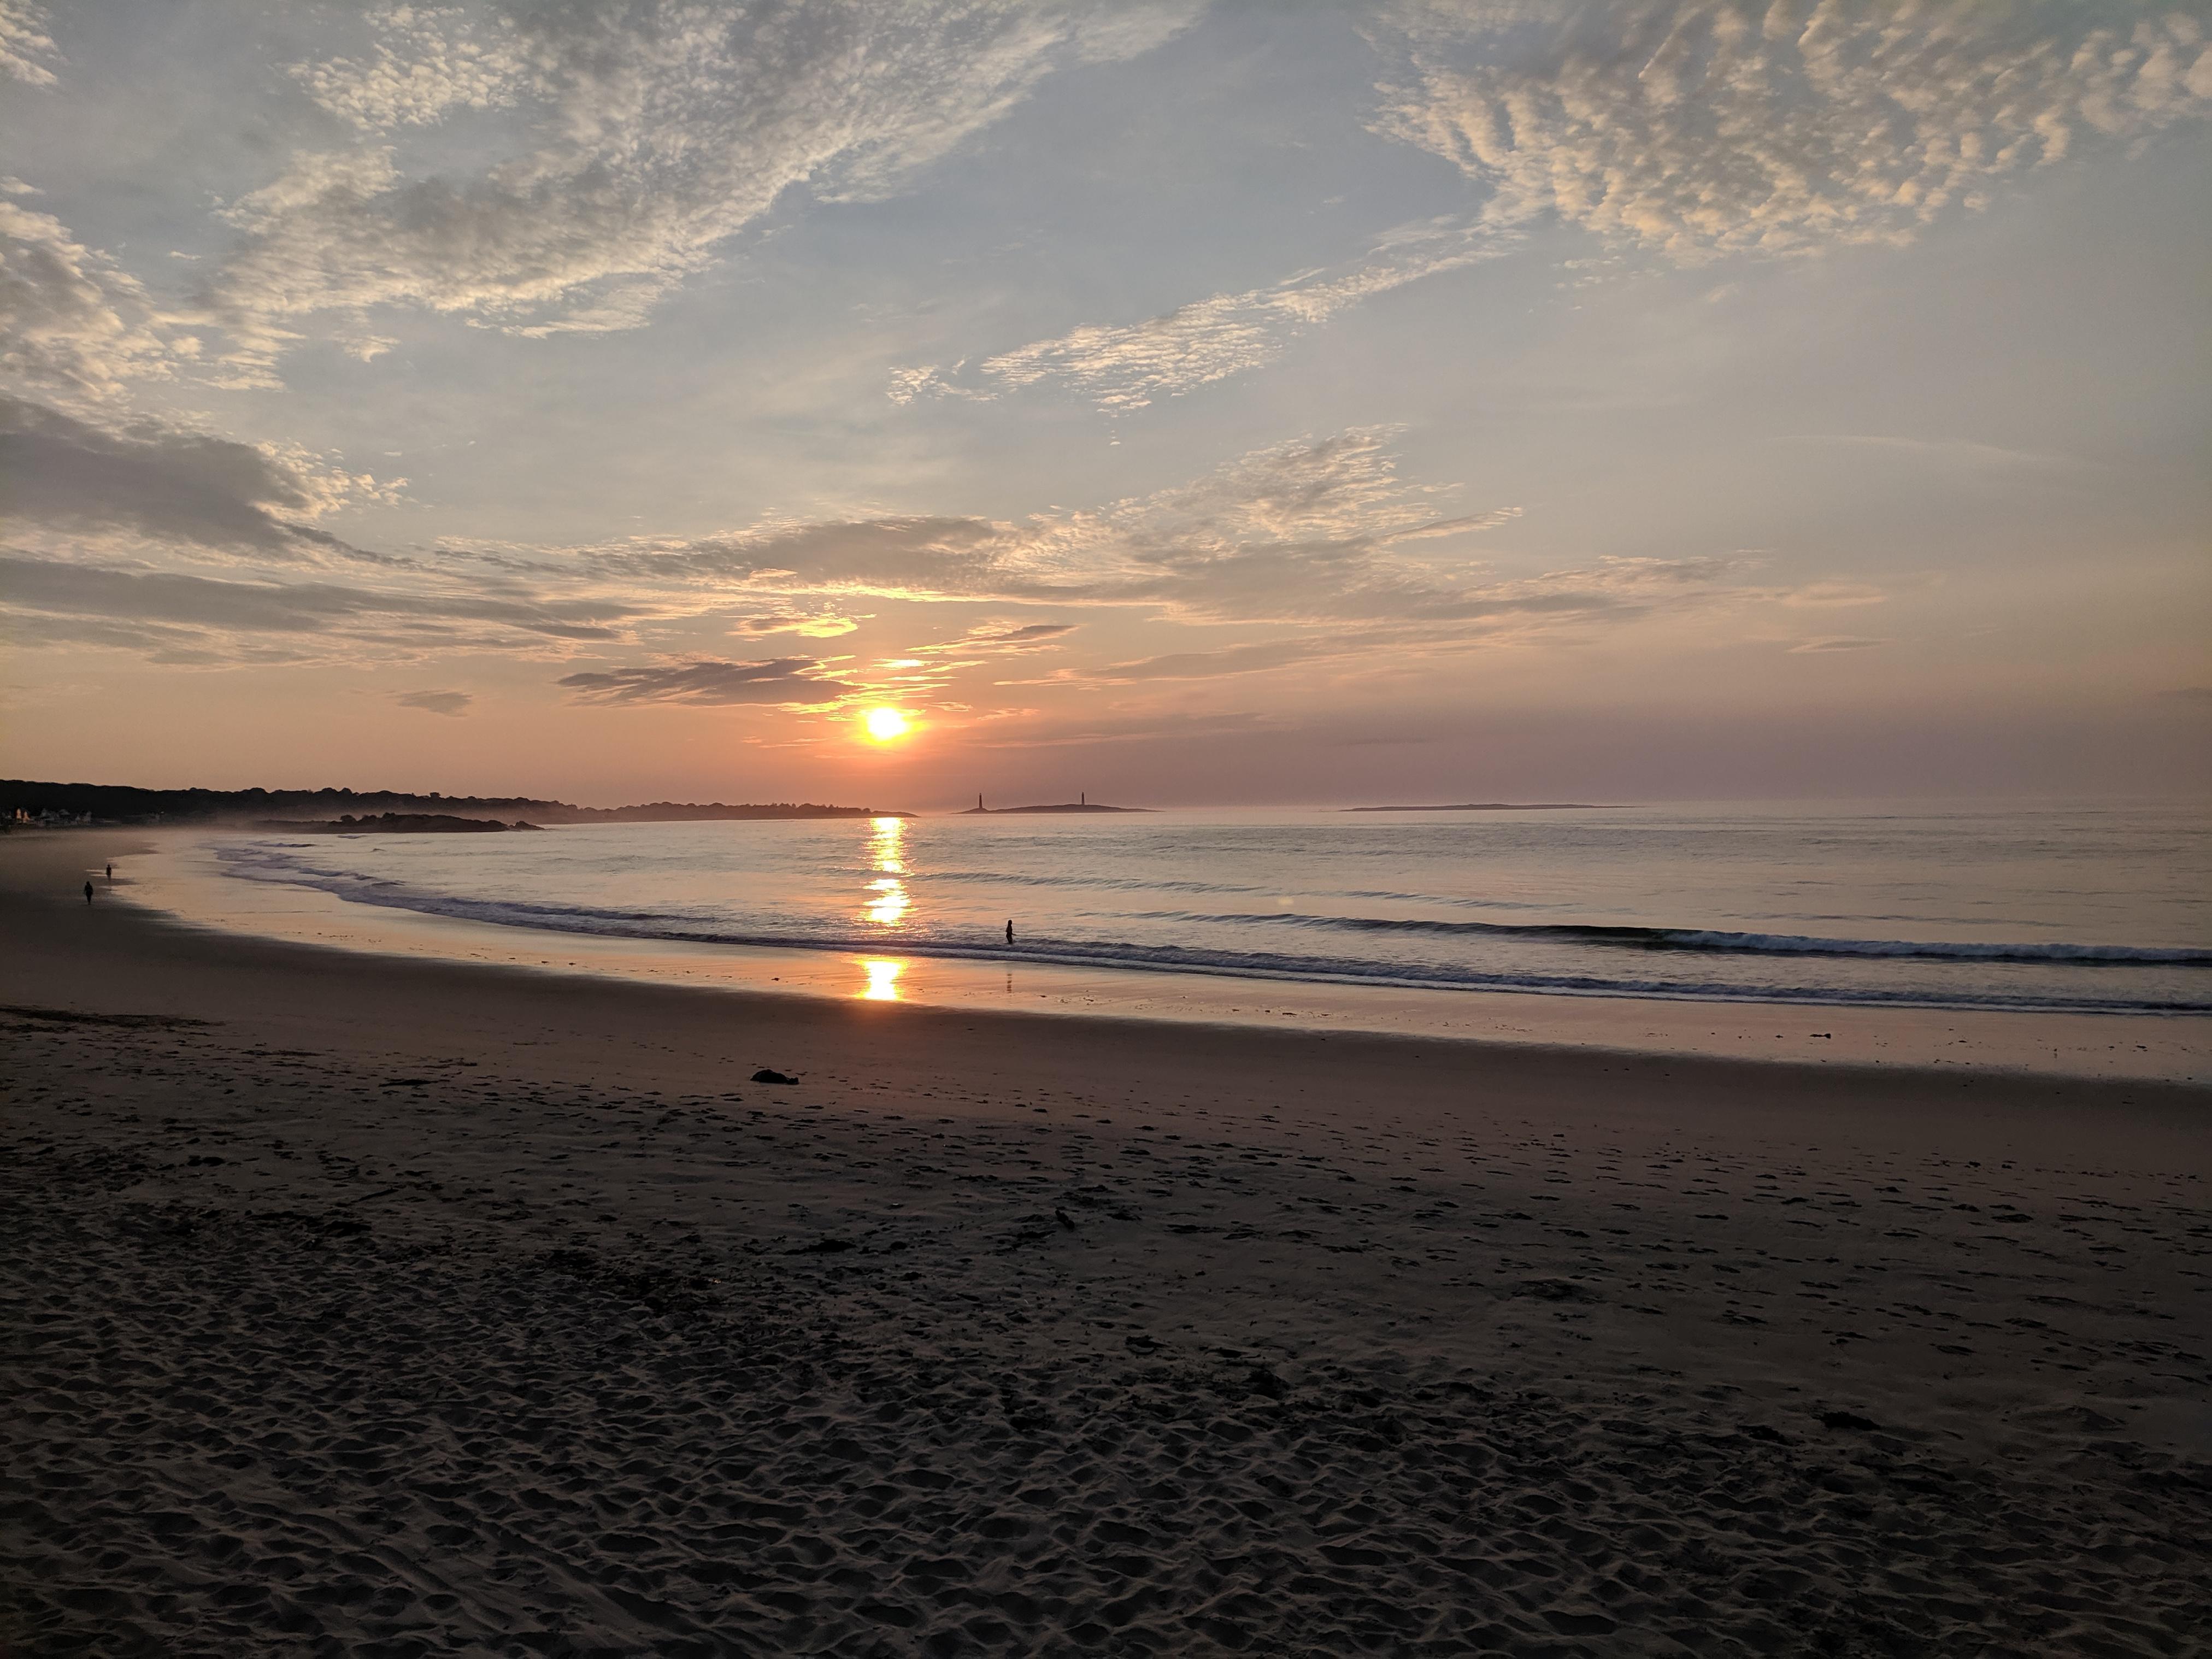 Morning Dip Long Beach Gloucester Rockport Mass_20190729_©c ryan.jpg